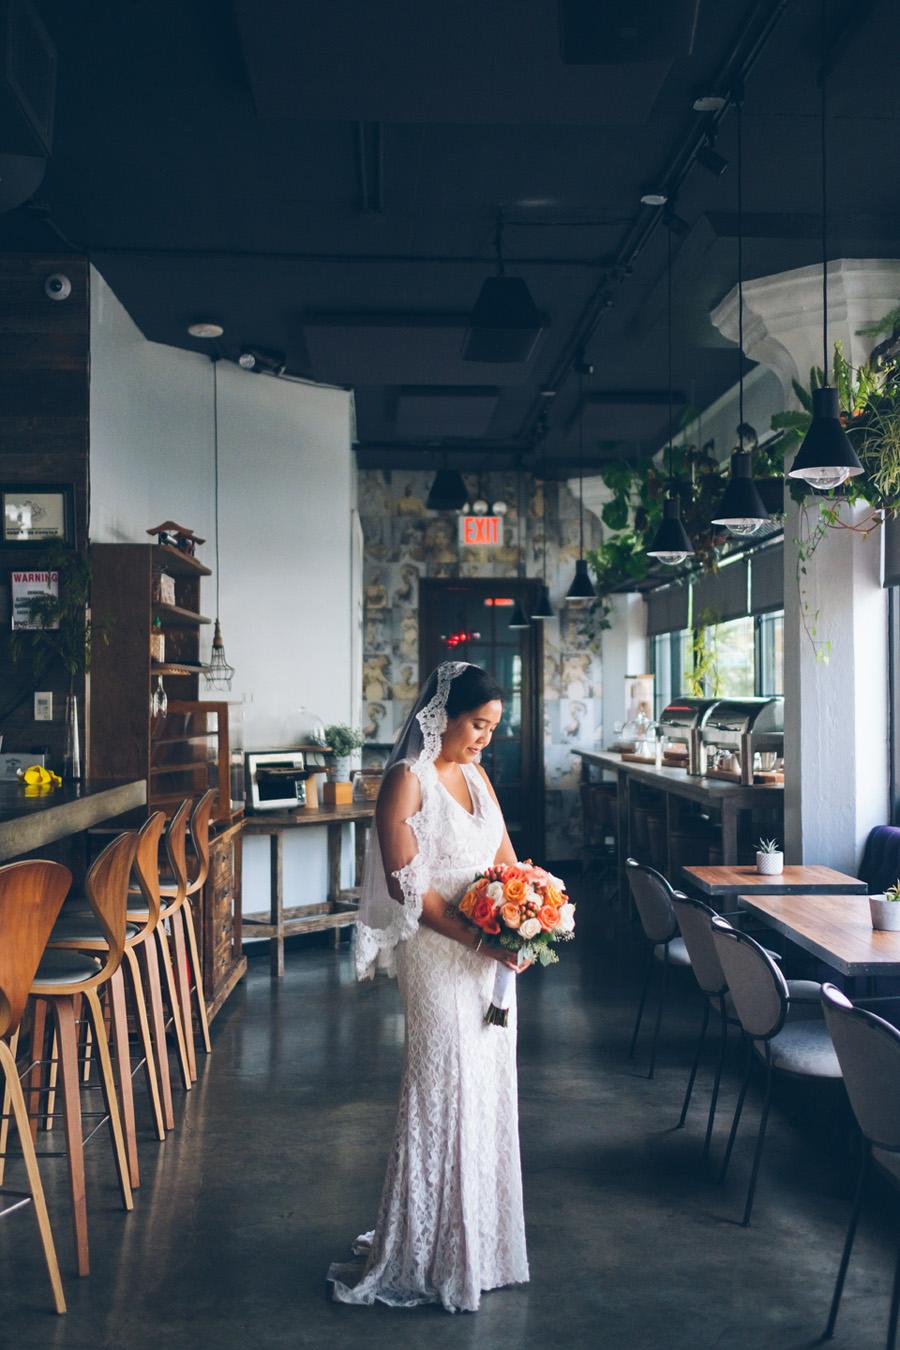 POOH-PETER-NYC-WEDDING-BRIDEGROOM-CYNTHIACHUNG-0098.jpg